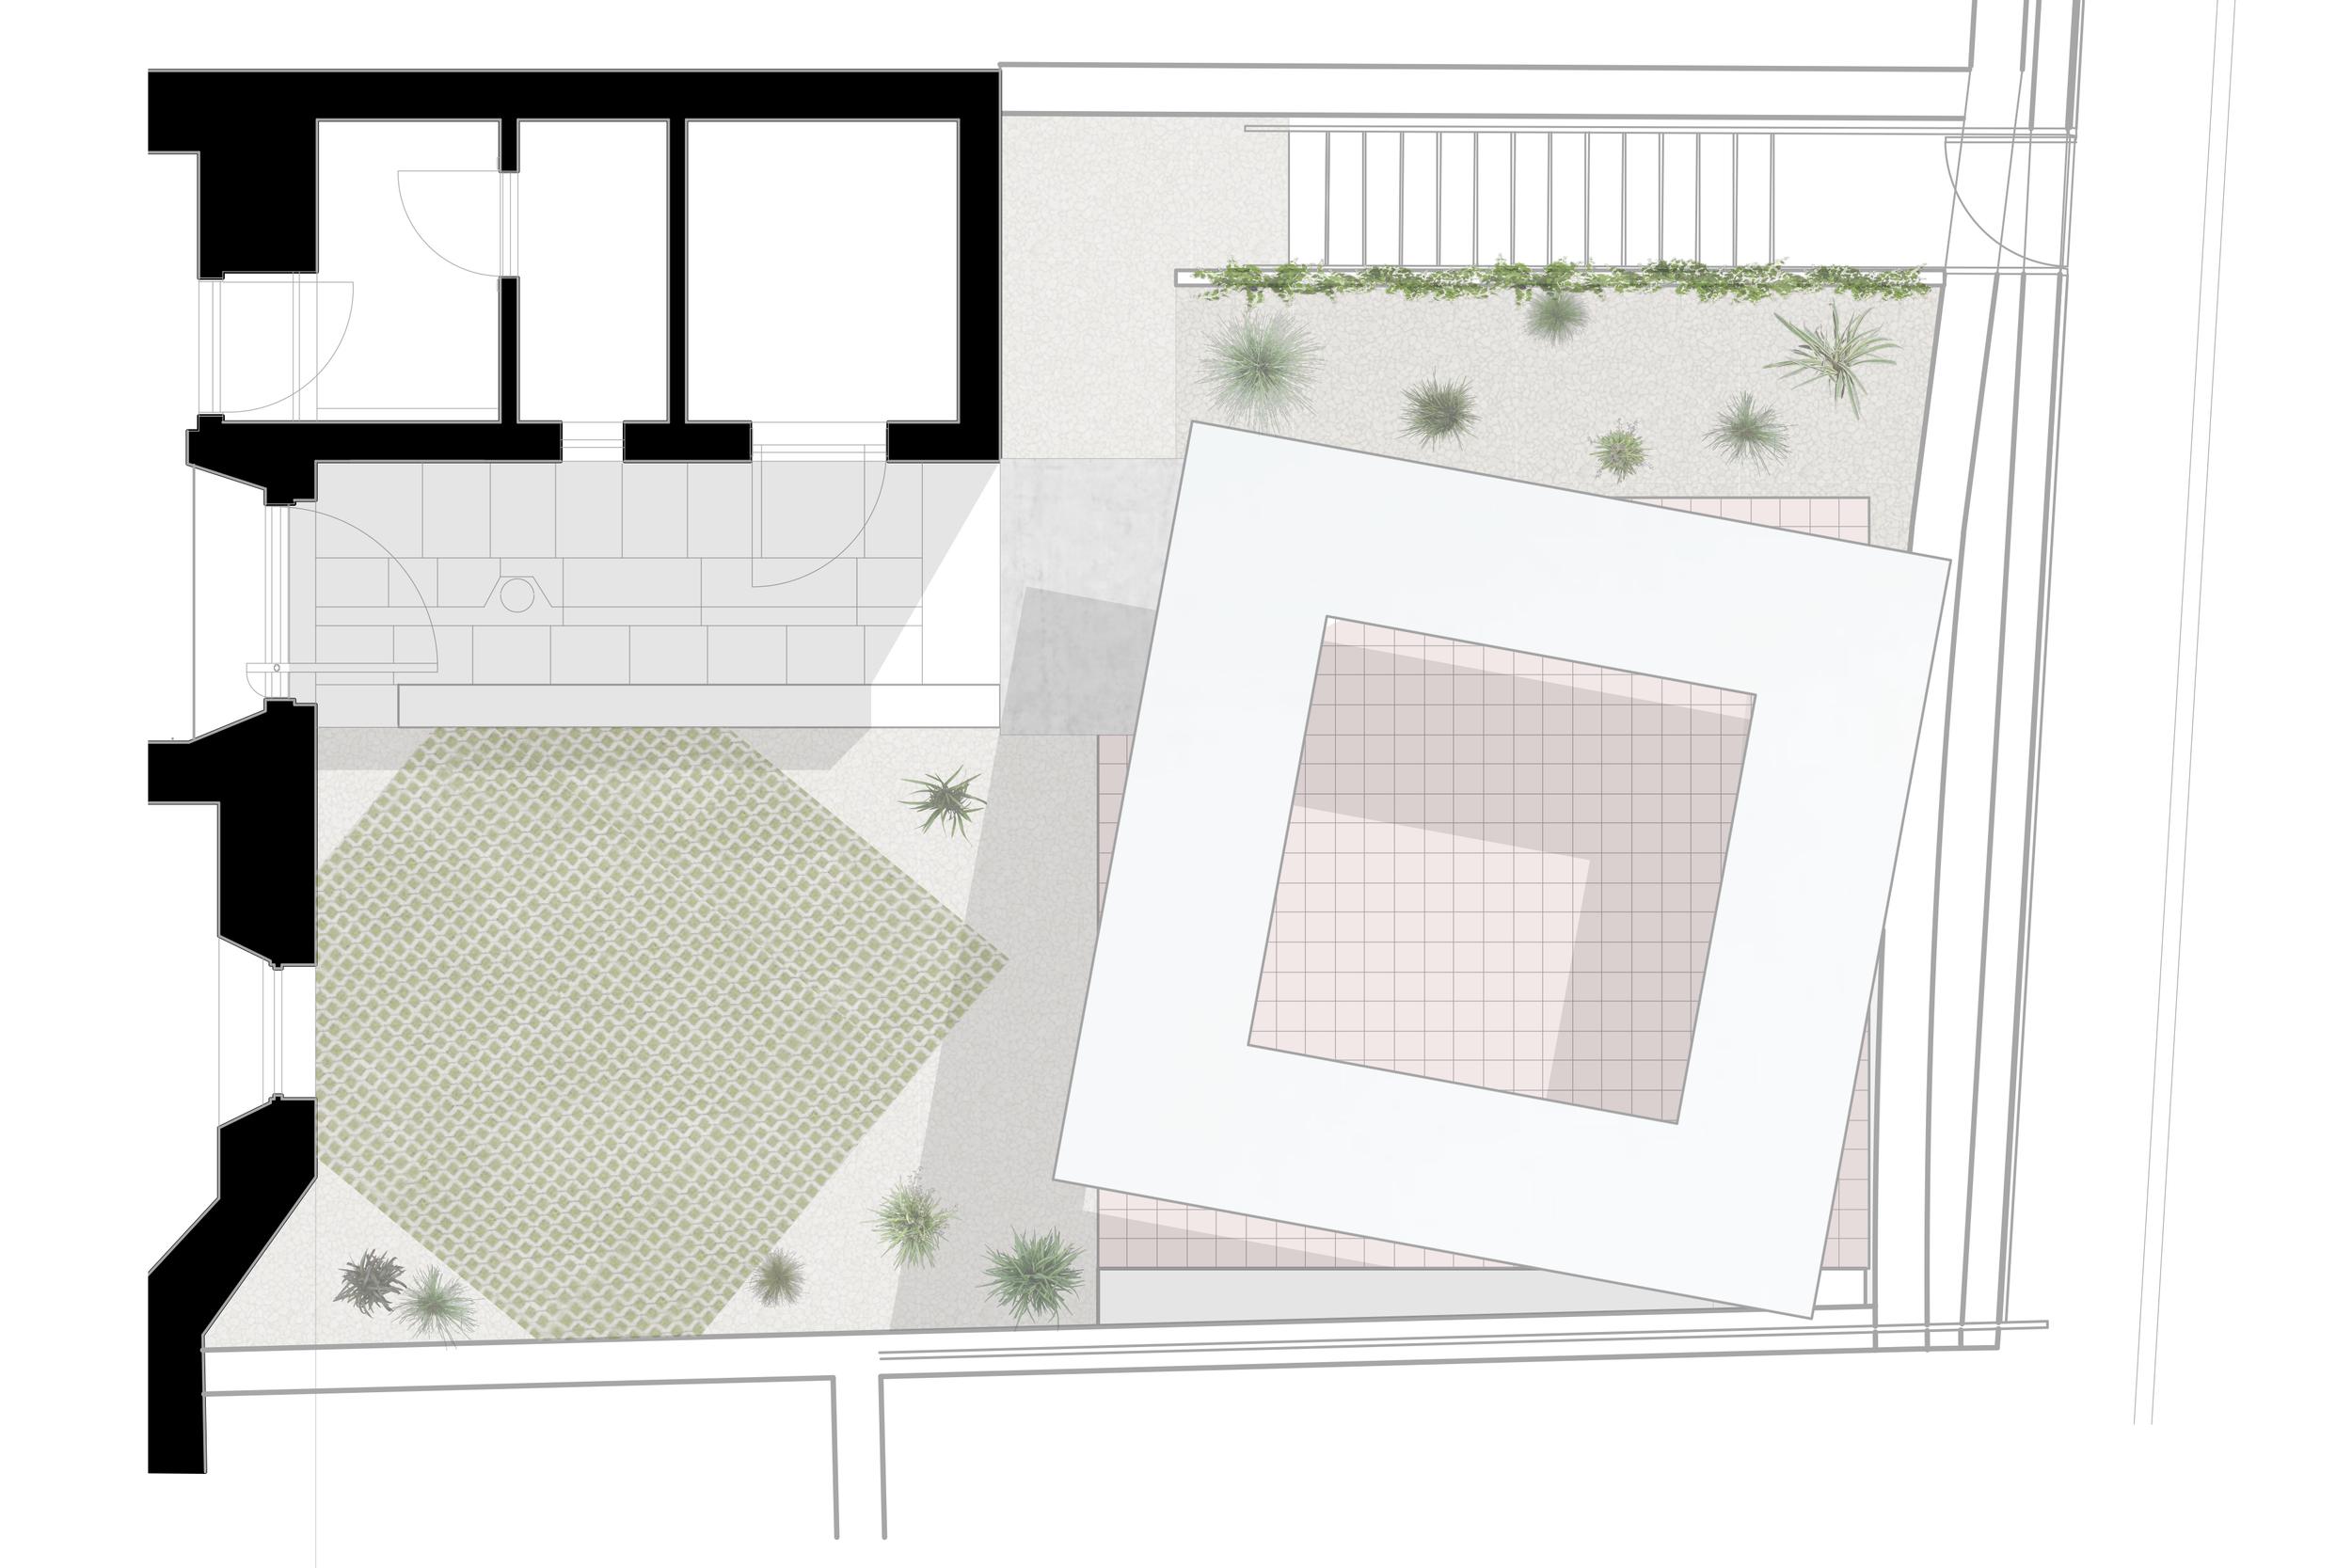 RCG-Web004- Plan.jpg